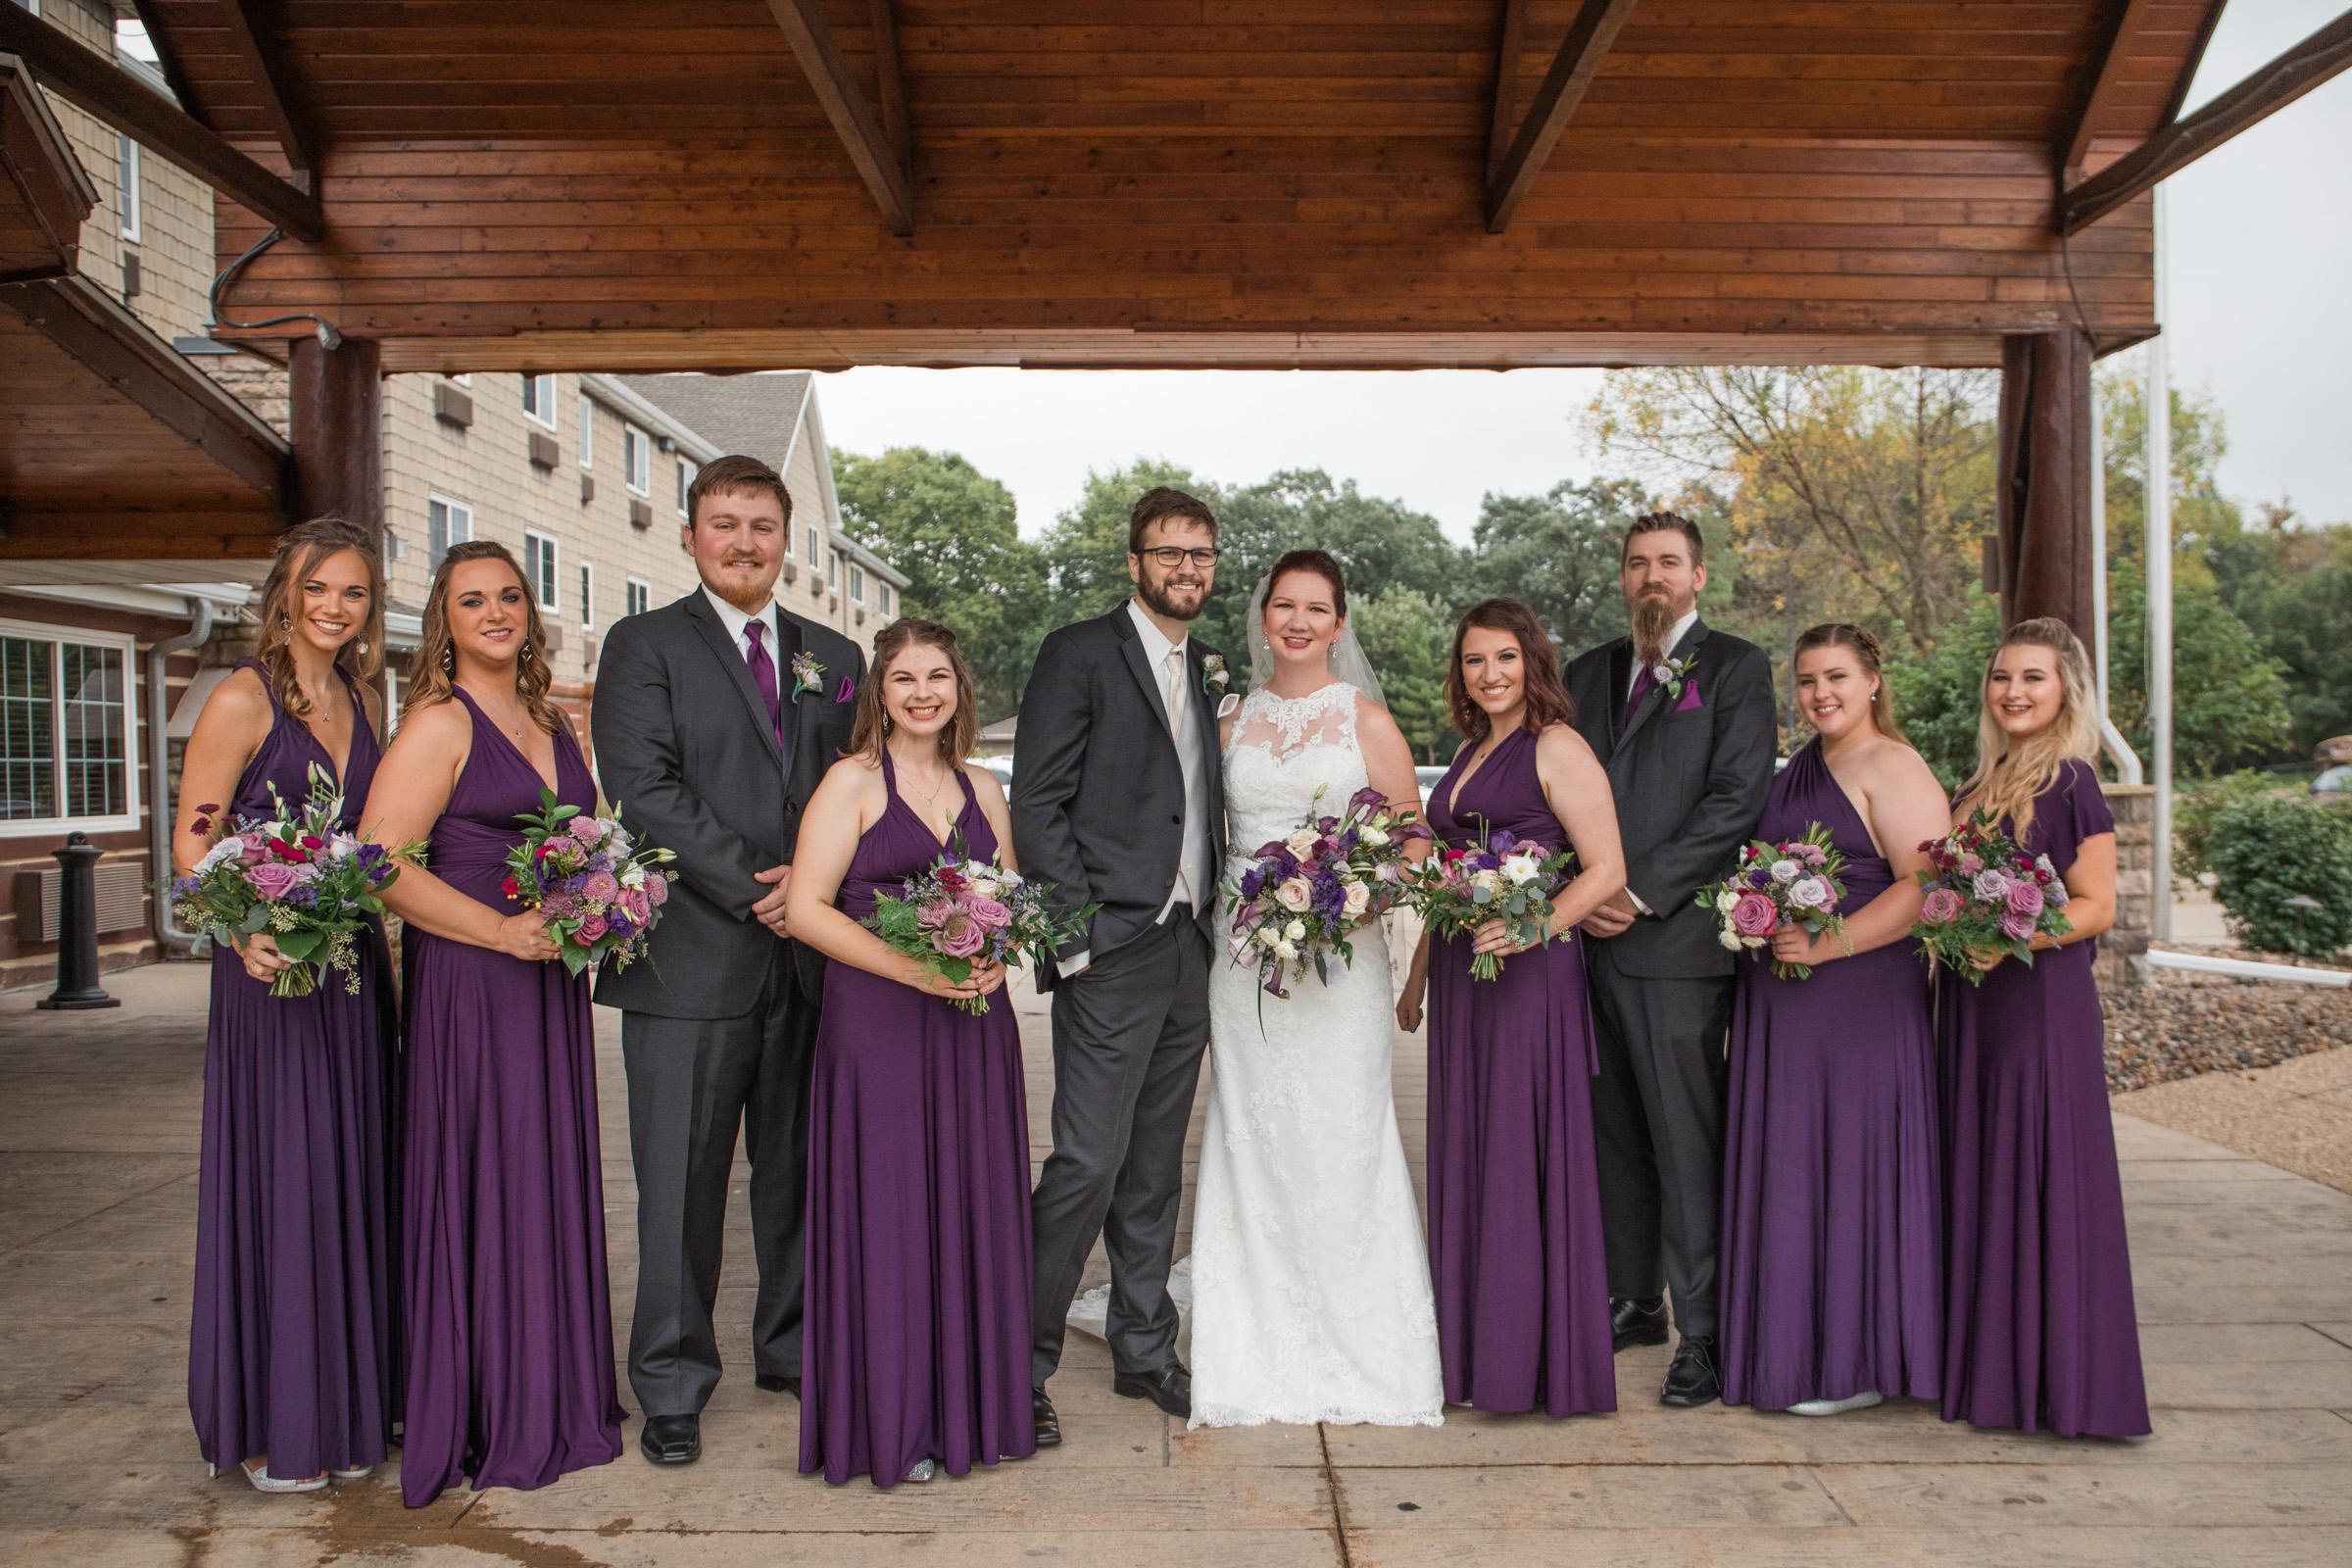 johnston_iowa_wedding_photographers-16.jpg